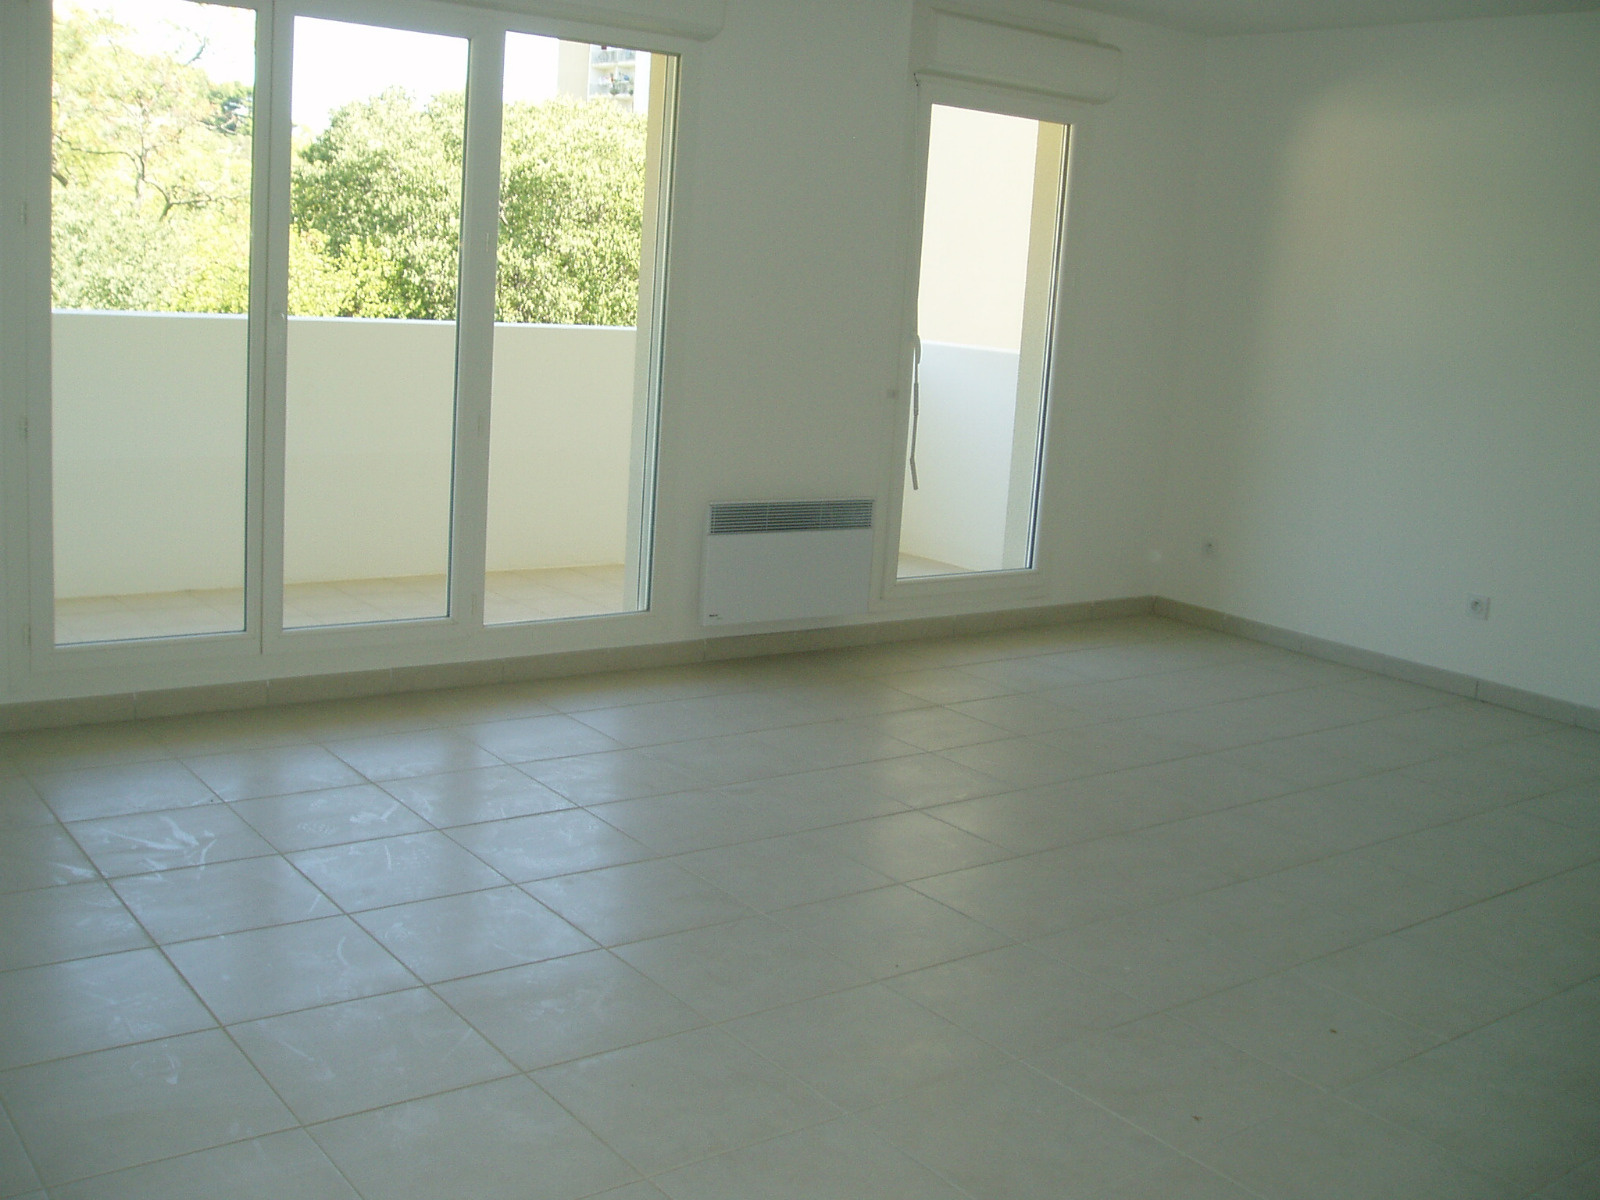 Appartement t4 louer marseille 13012 for Garage a louer marseille 13012